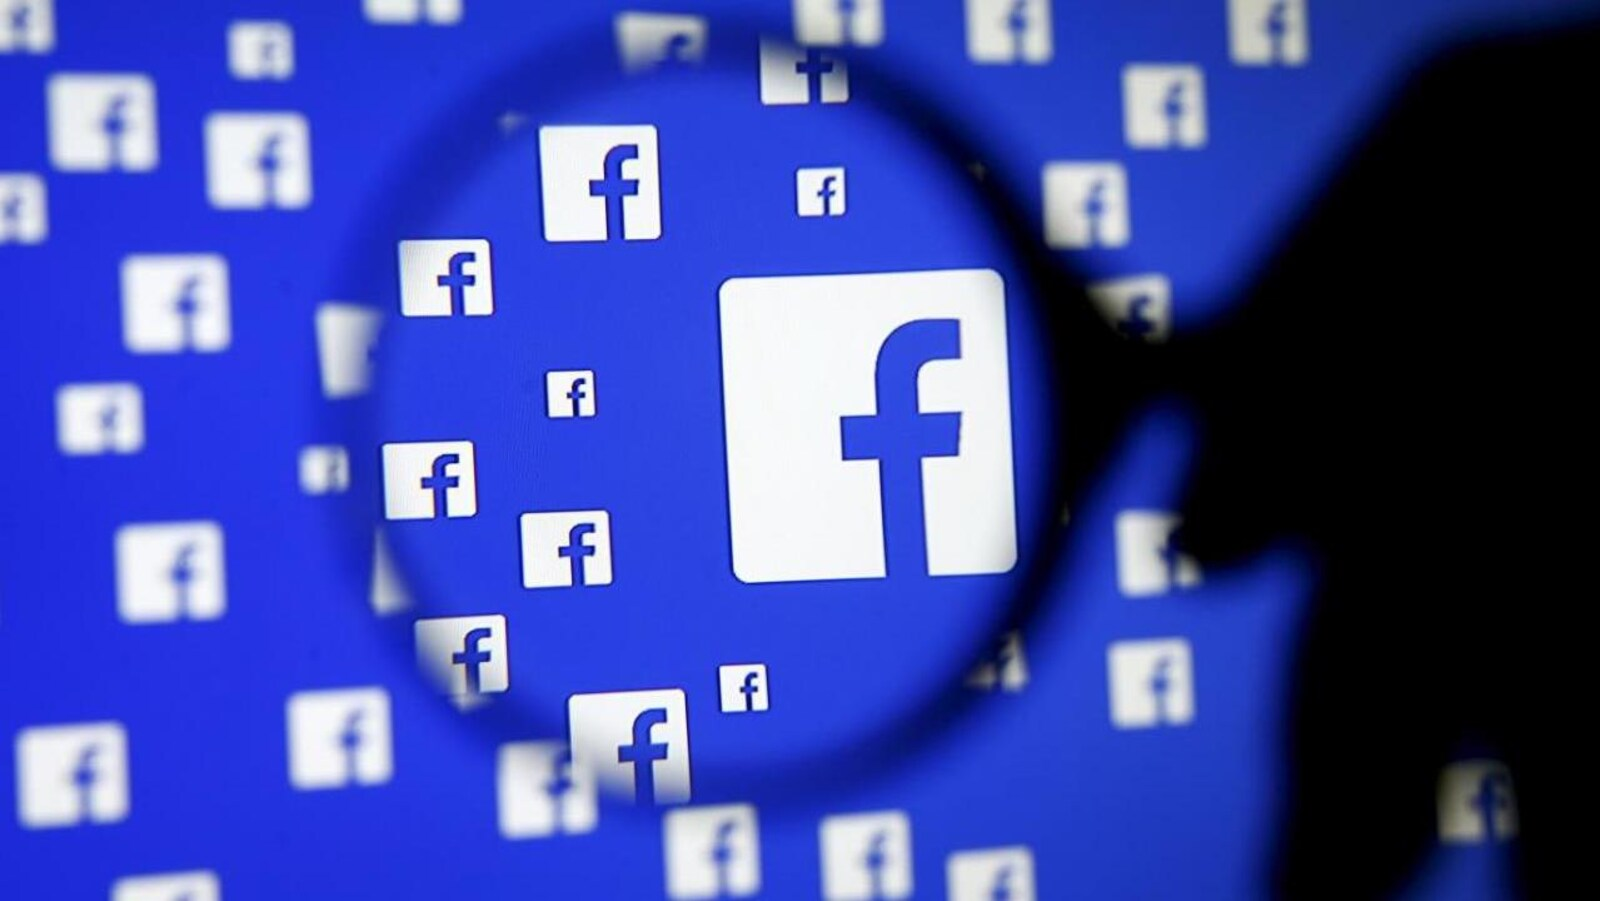 Le logo de facebook sur un écran